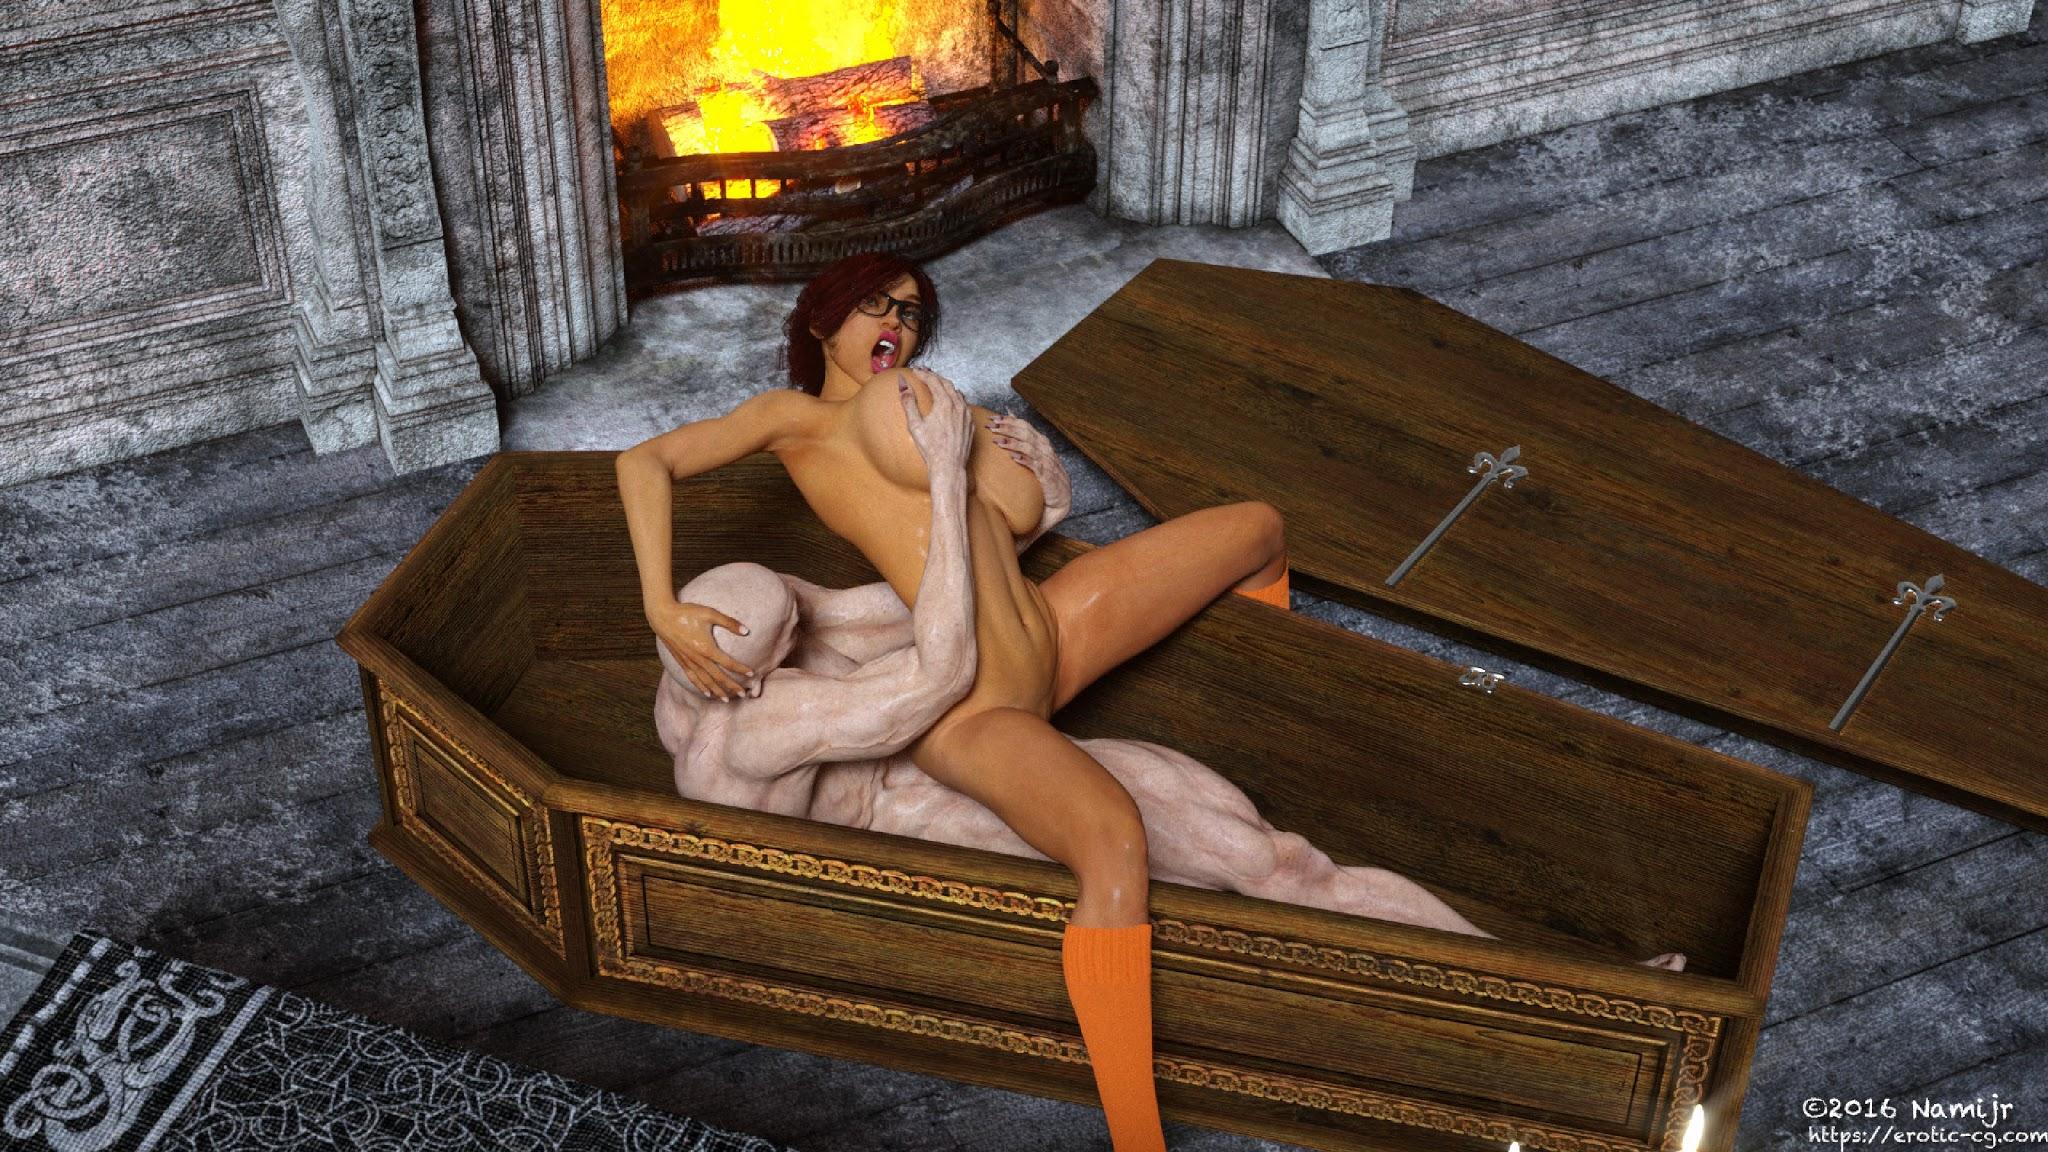 Hình ảnh  %2B%252816%2529 in Coffin Pleasure